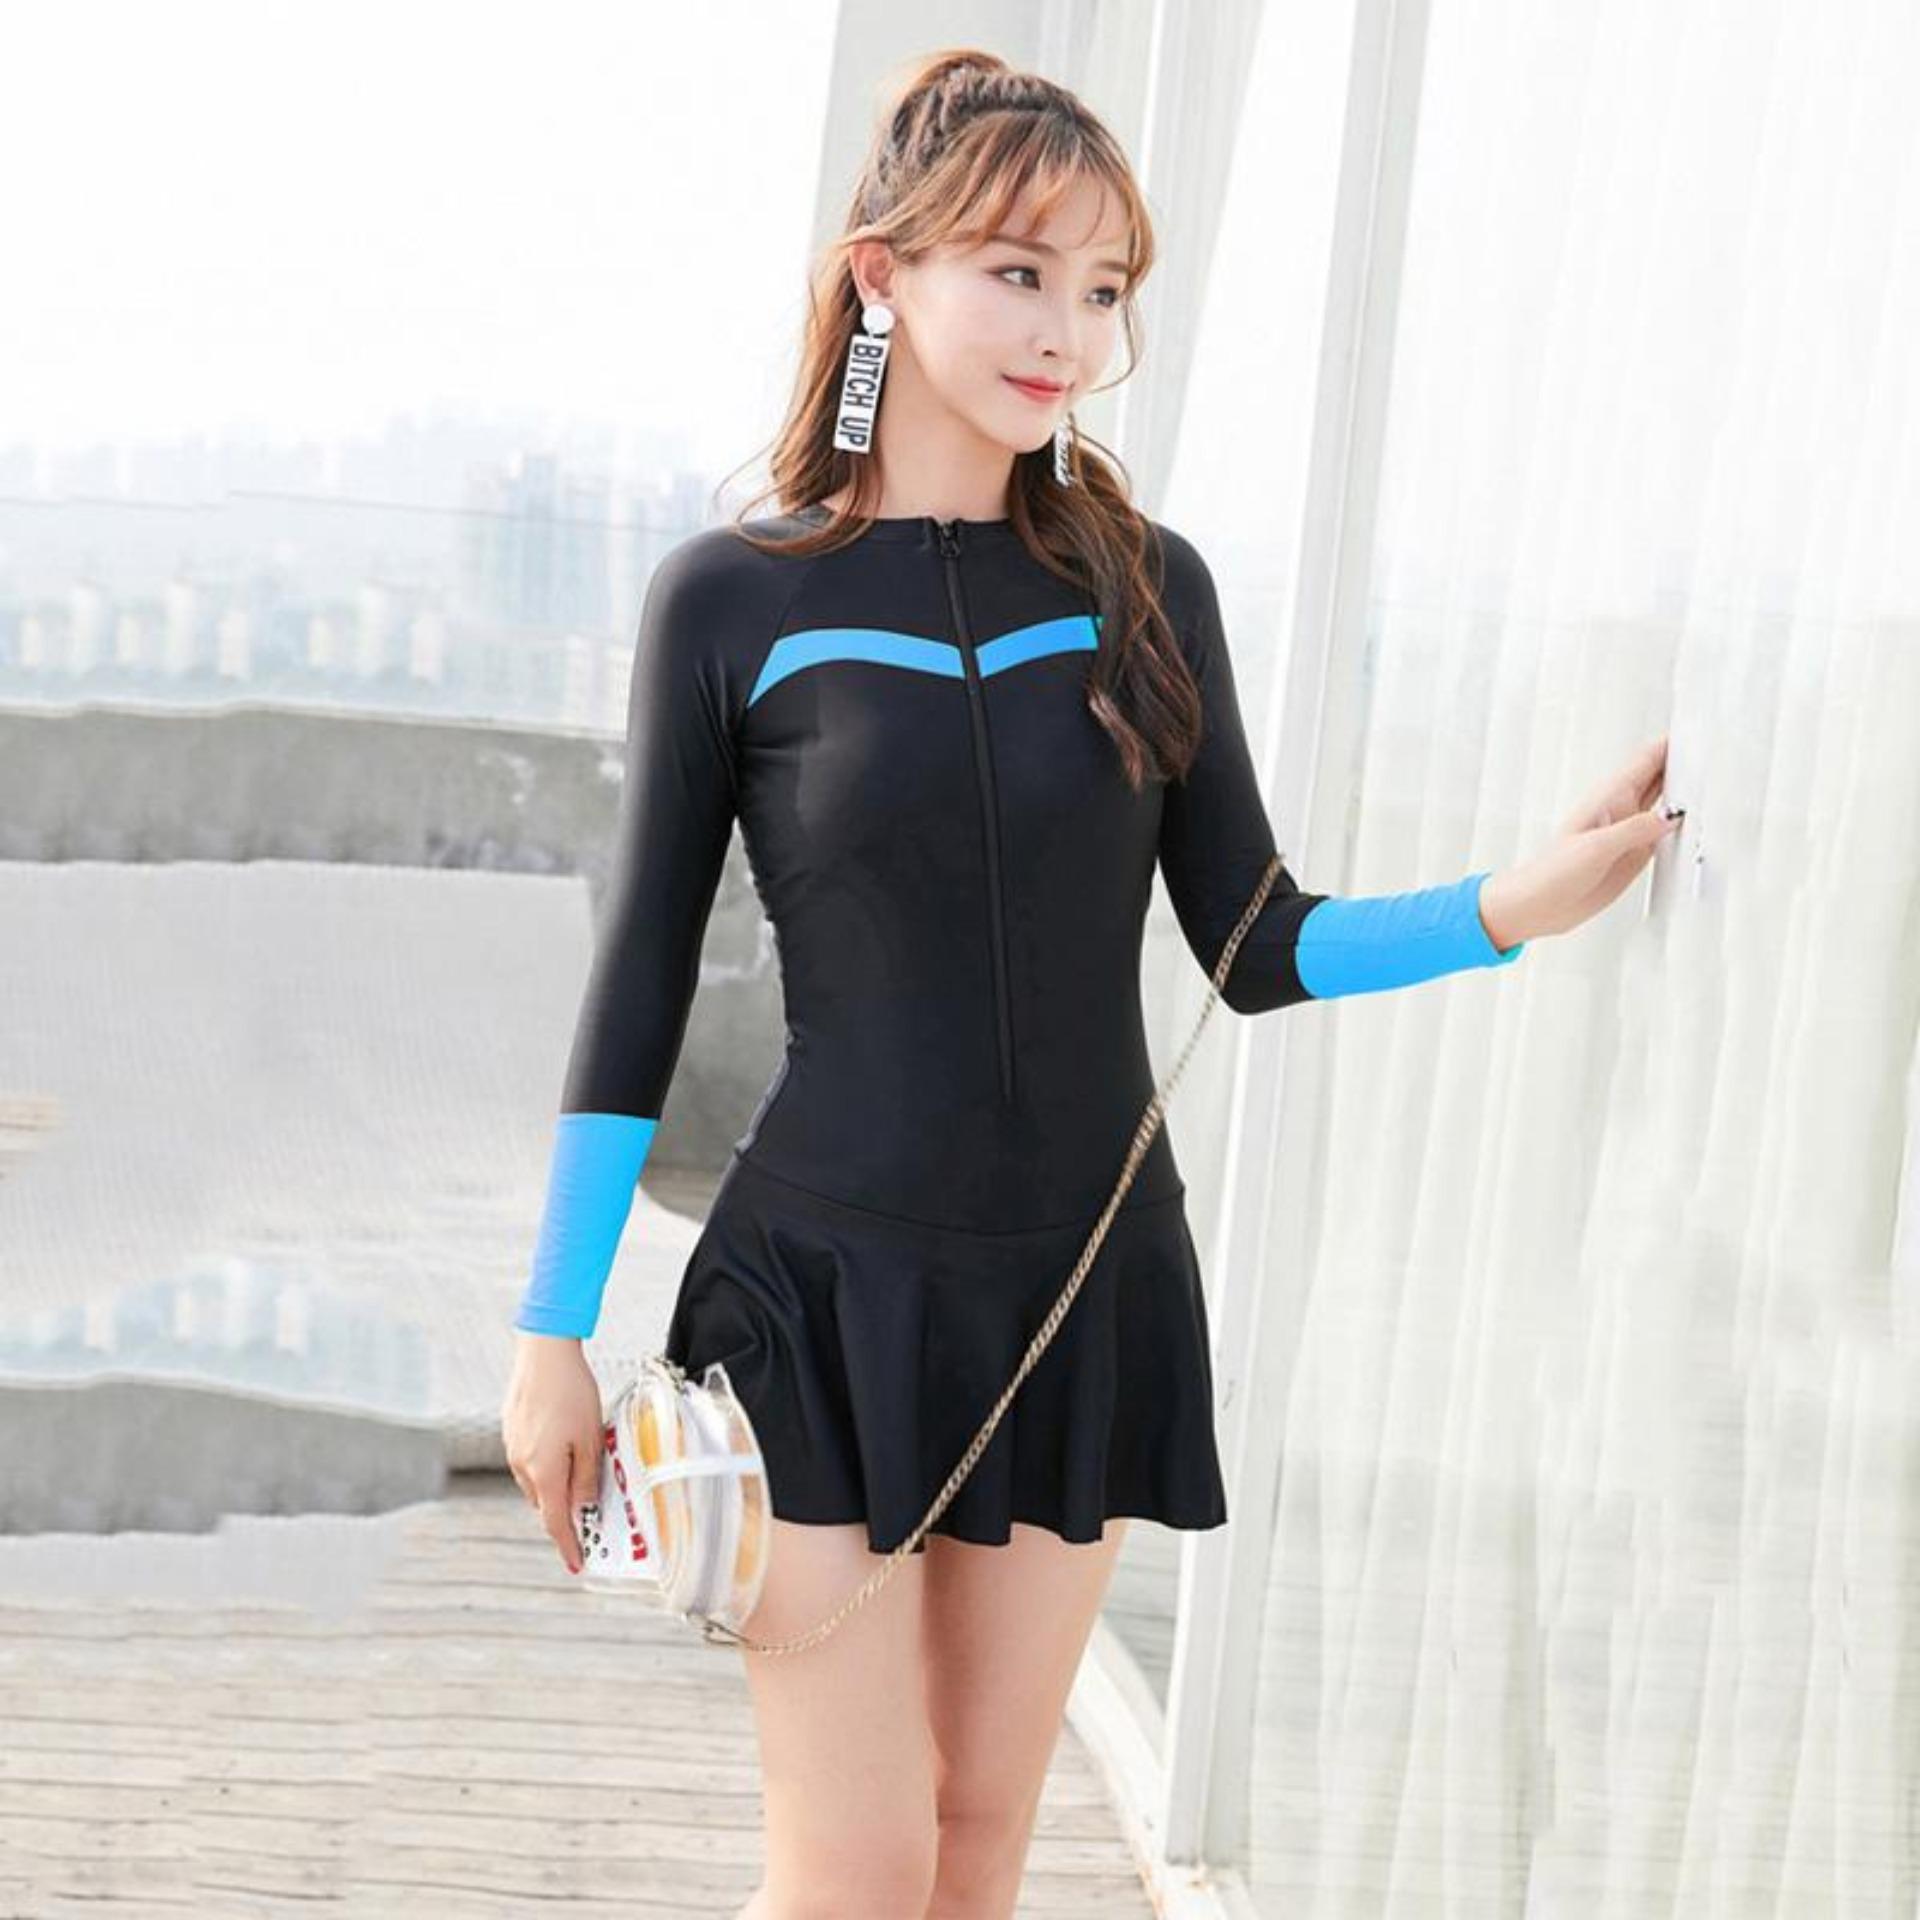 M-4xl Plus Size Sports Swimwear Cute Woman Zipper One Piece Swimsuit Skirts Bottom Beachwear Sexy Bathing Suit Women 2019 Zipper Front Long Sleeve Swim Suit By Limerence.